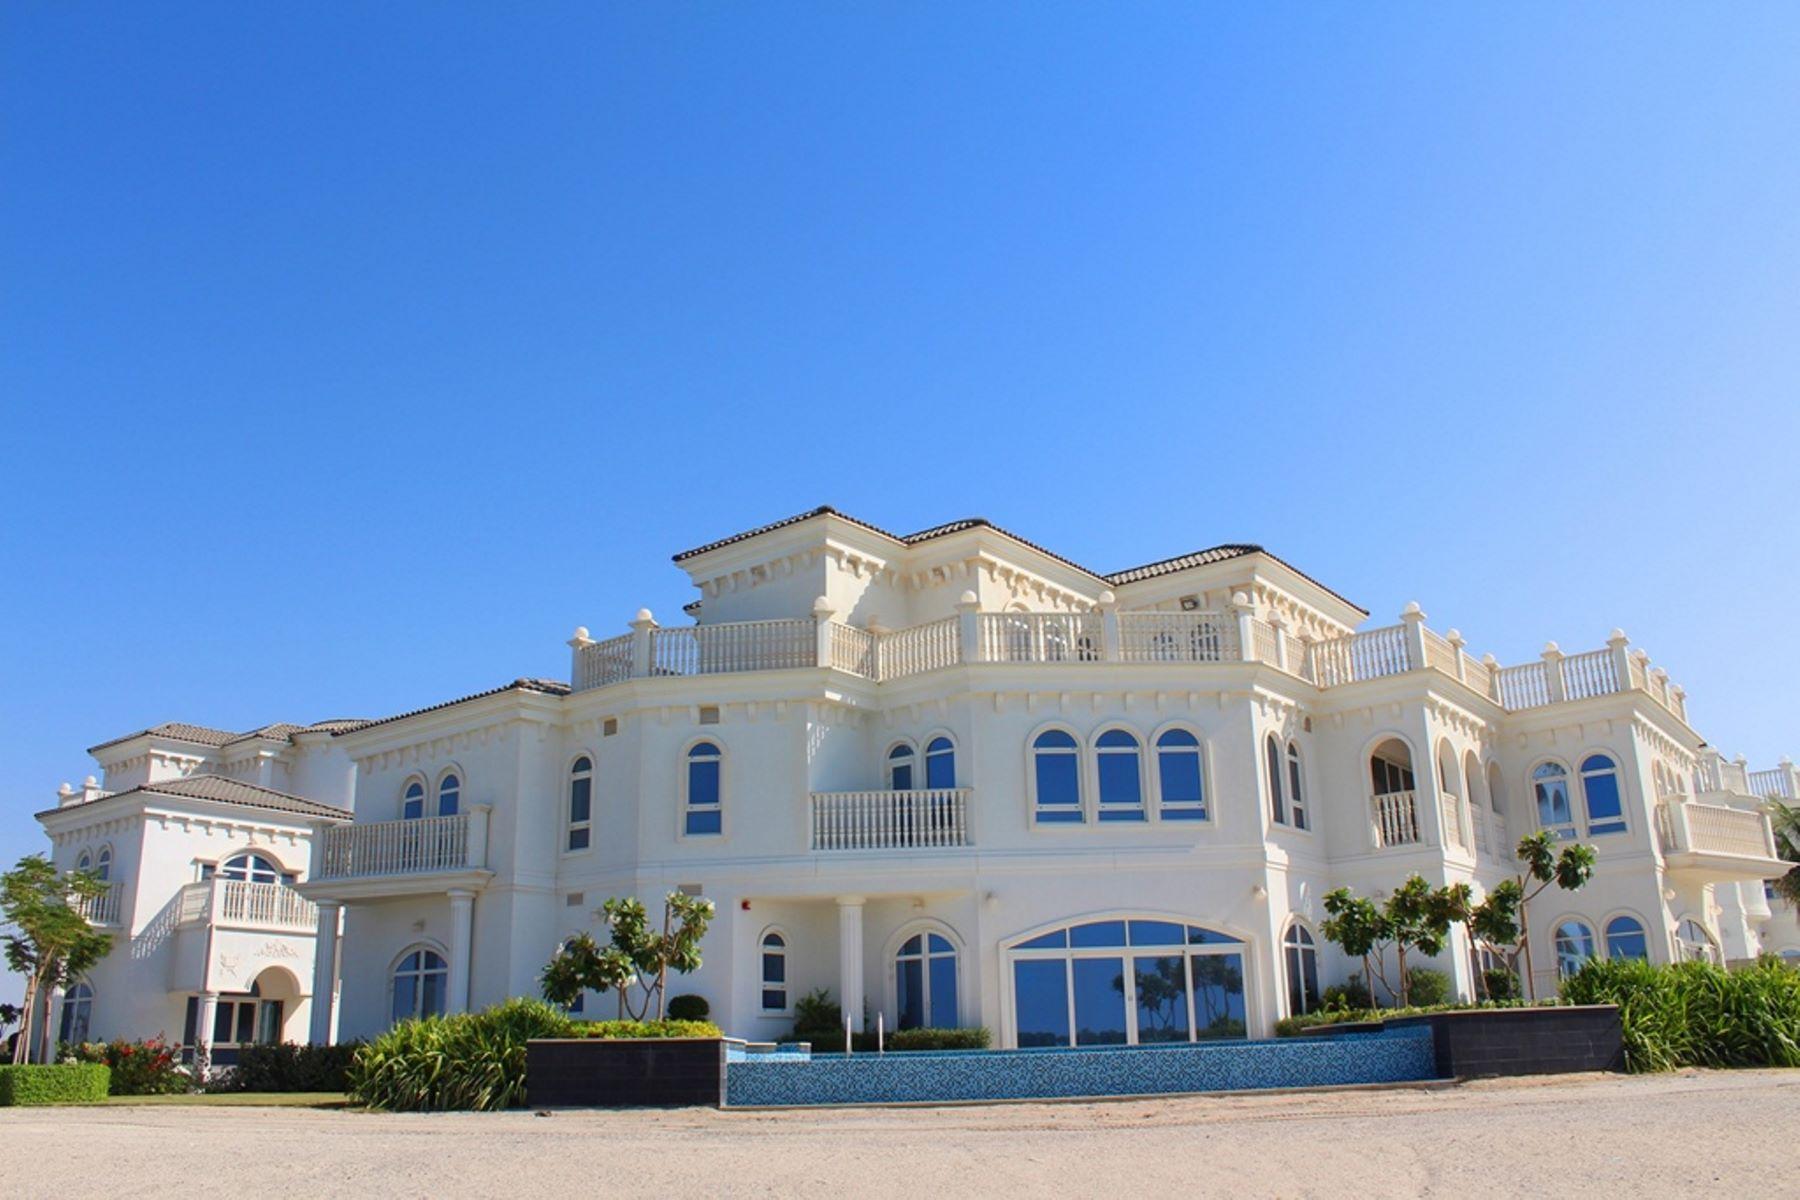 Property for Sale at Brand New Built 4 Luxury Villas Dubai, Dubai United Arab Emirates